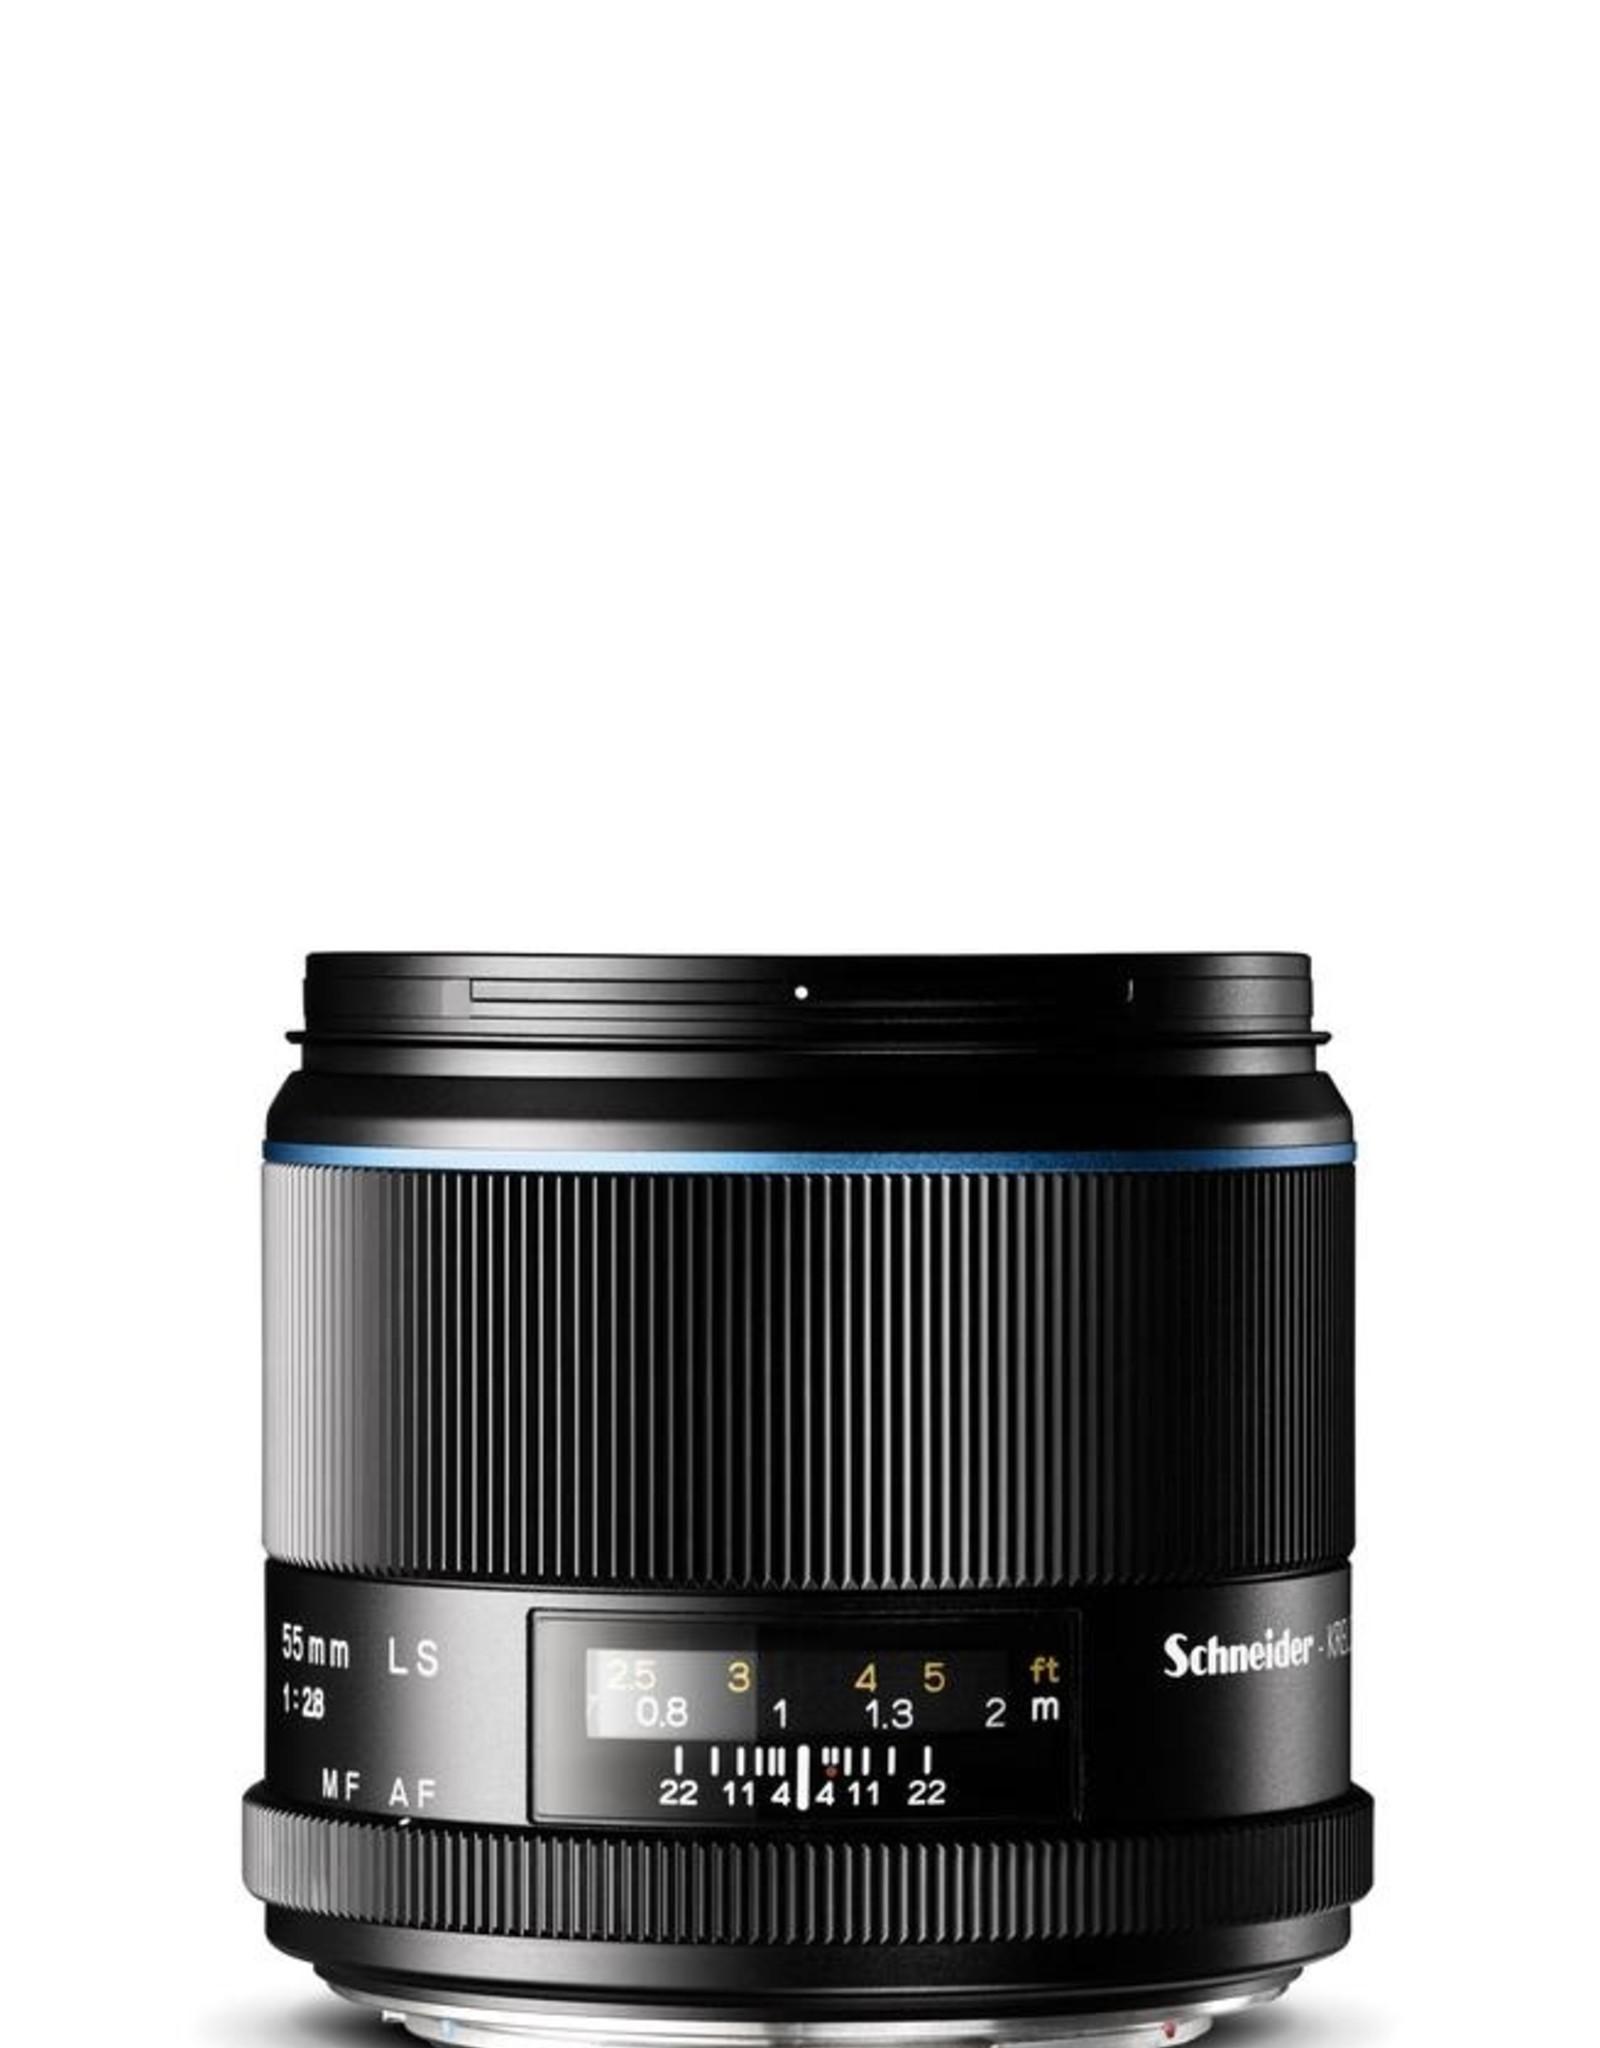 Phase One Phase One Schneider Kreuznach 55mm LS f/2.8 Blue Ring Lens